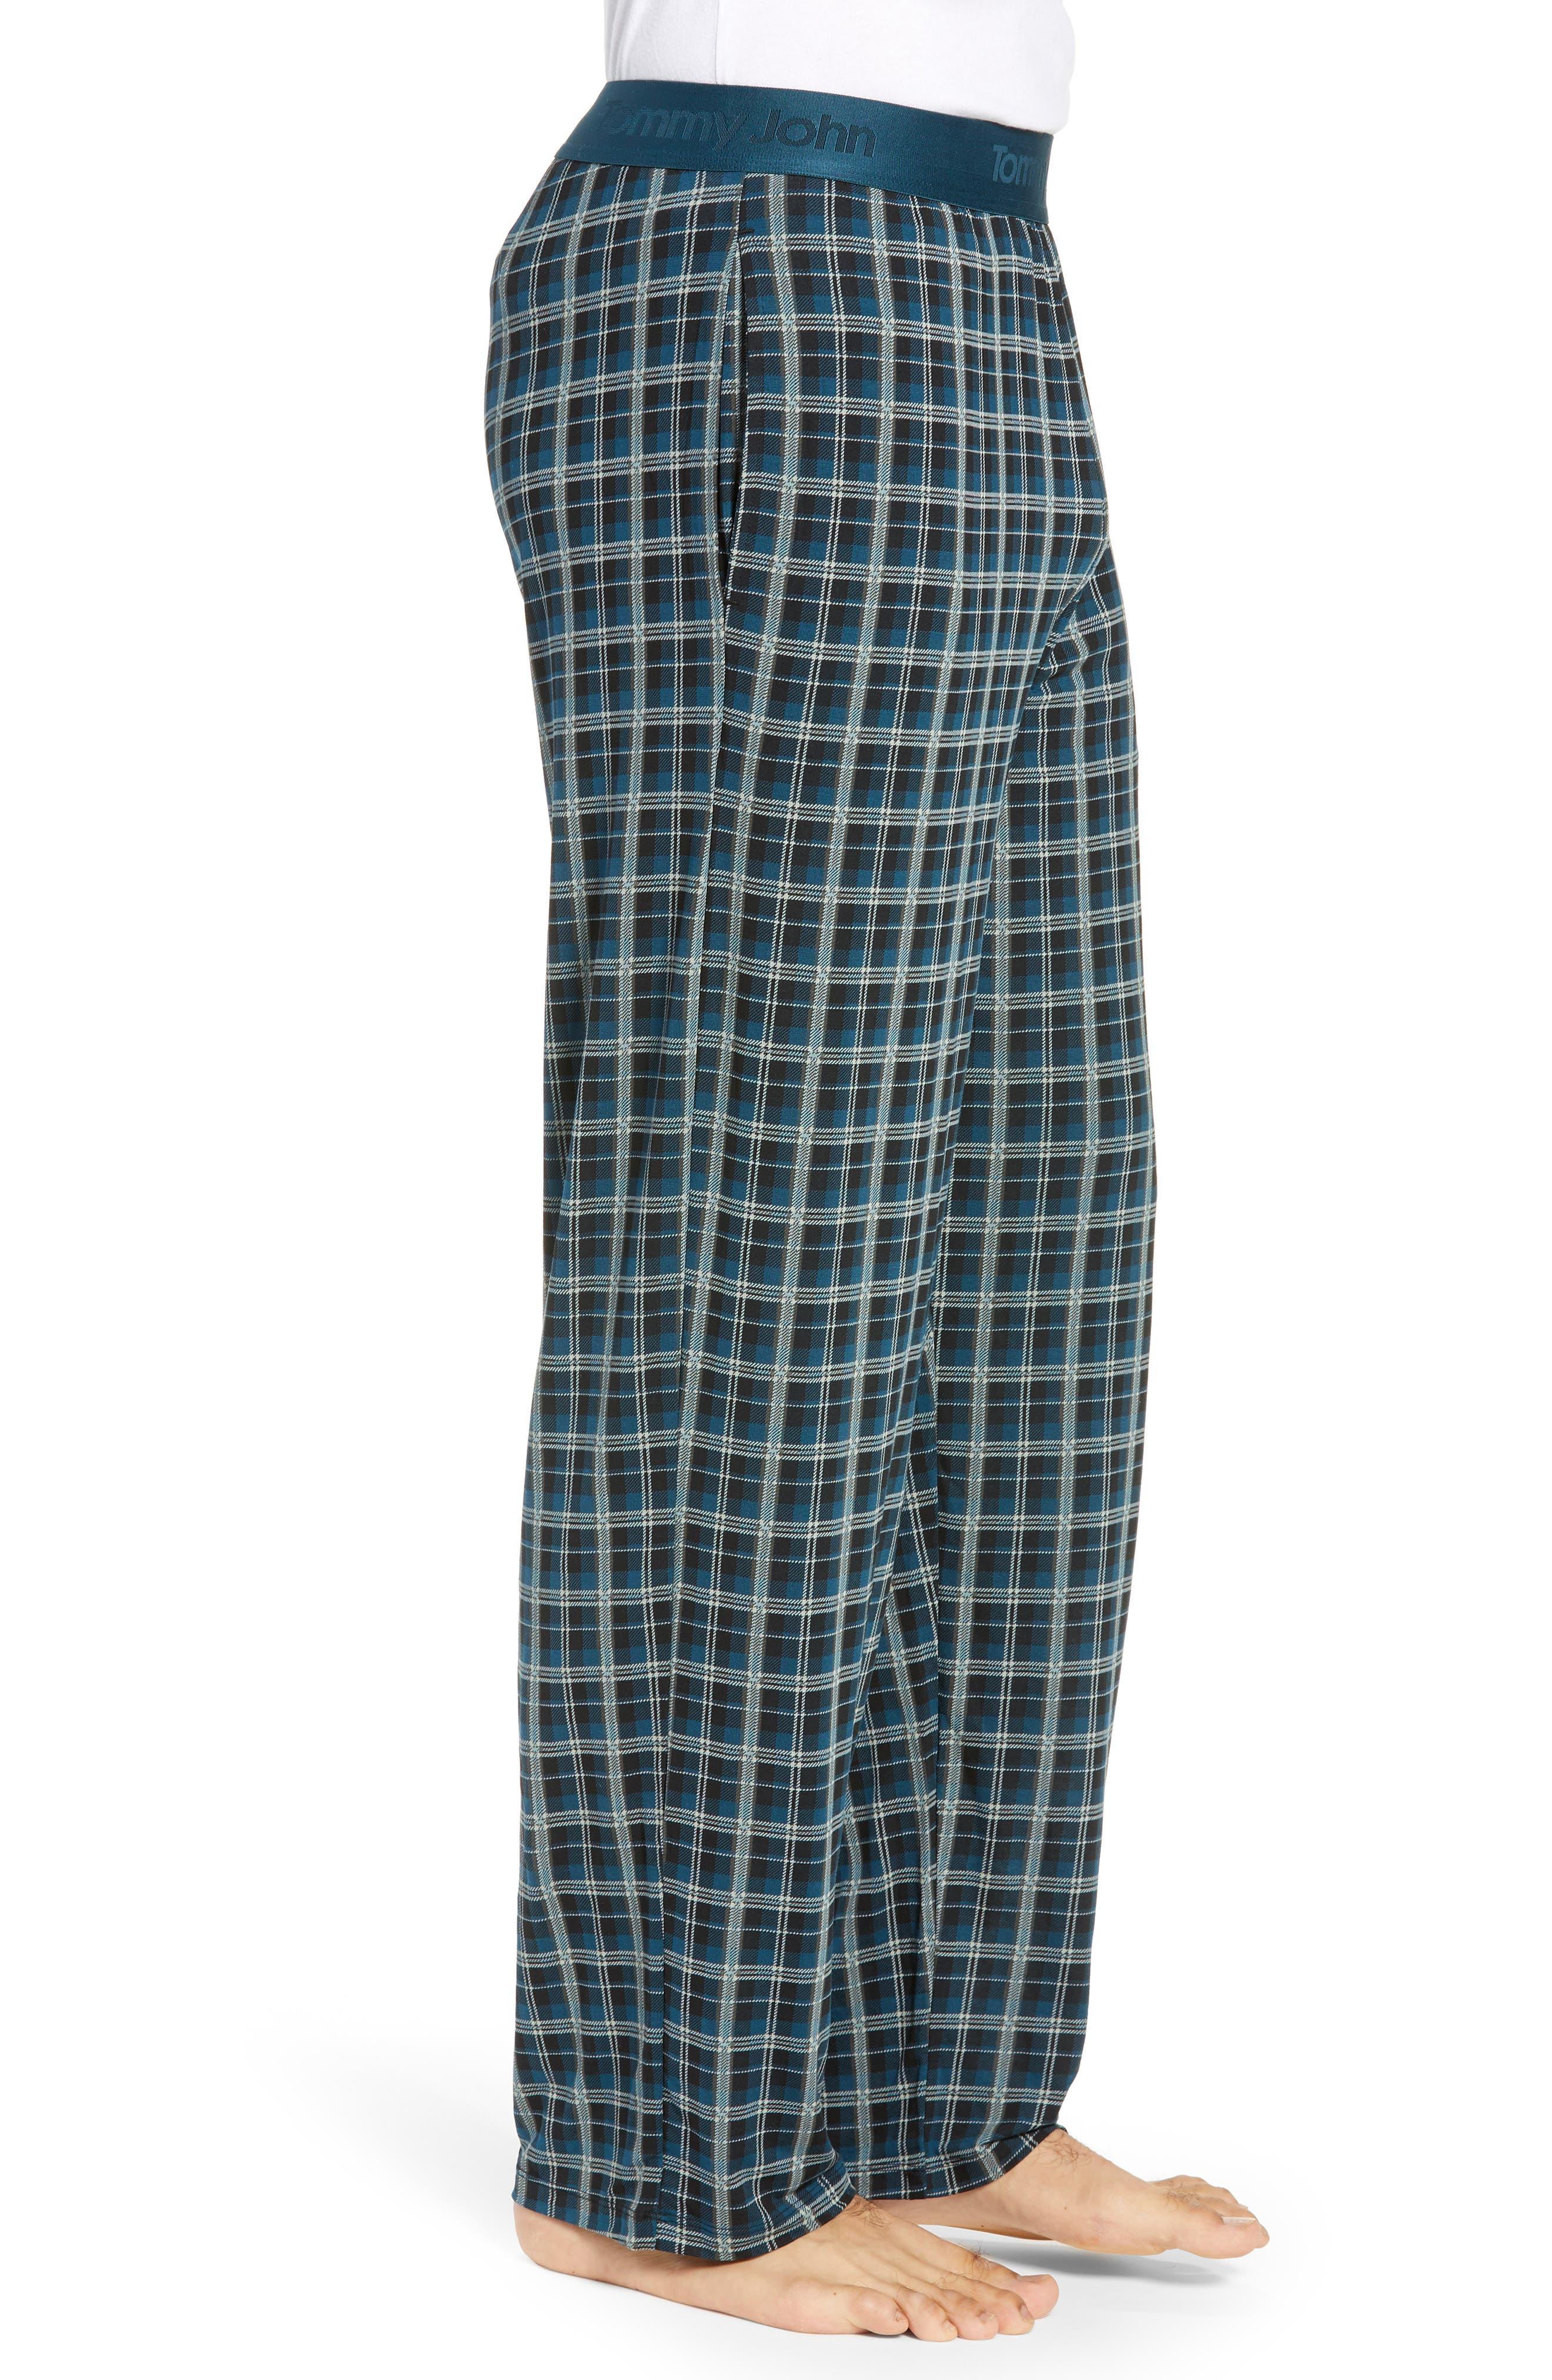 Second Skin Stretch Modal Pajama Pants,                             Alternate thumbnail 3, color,                             REFLECTING POND PLAID